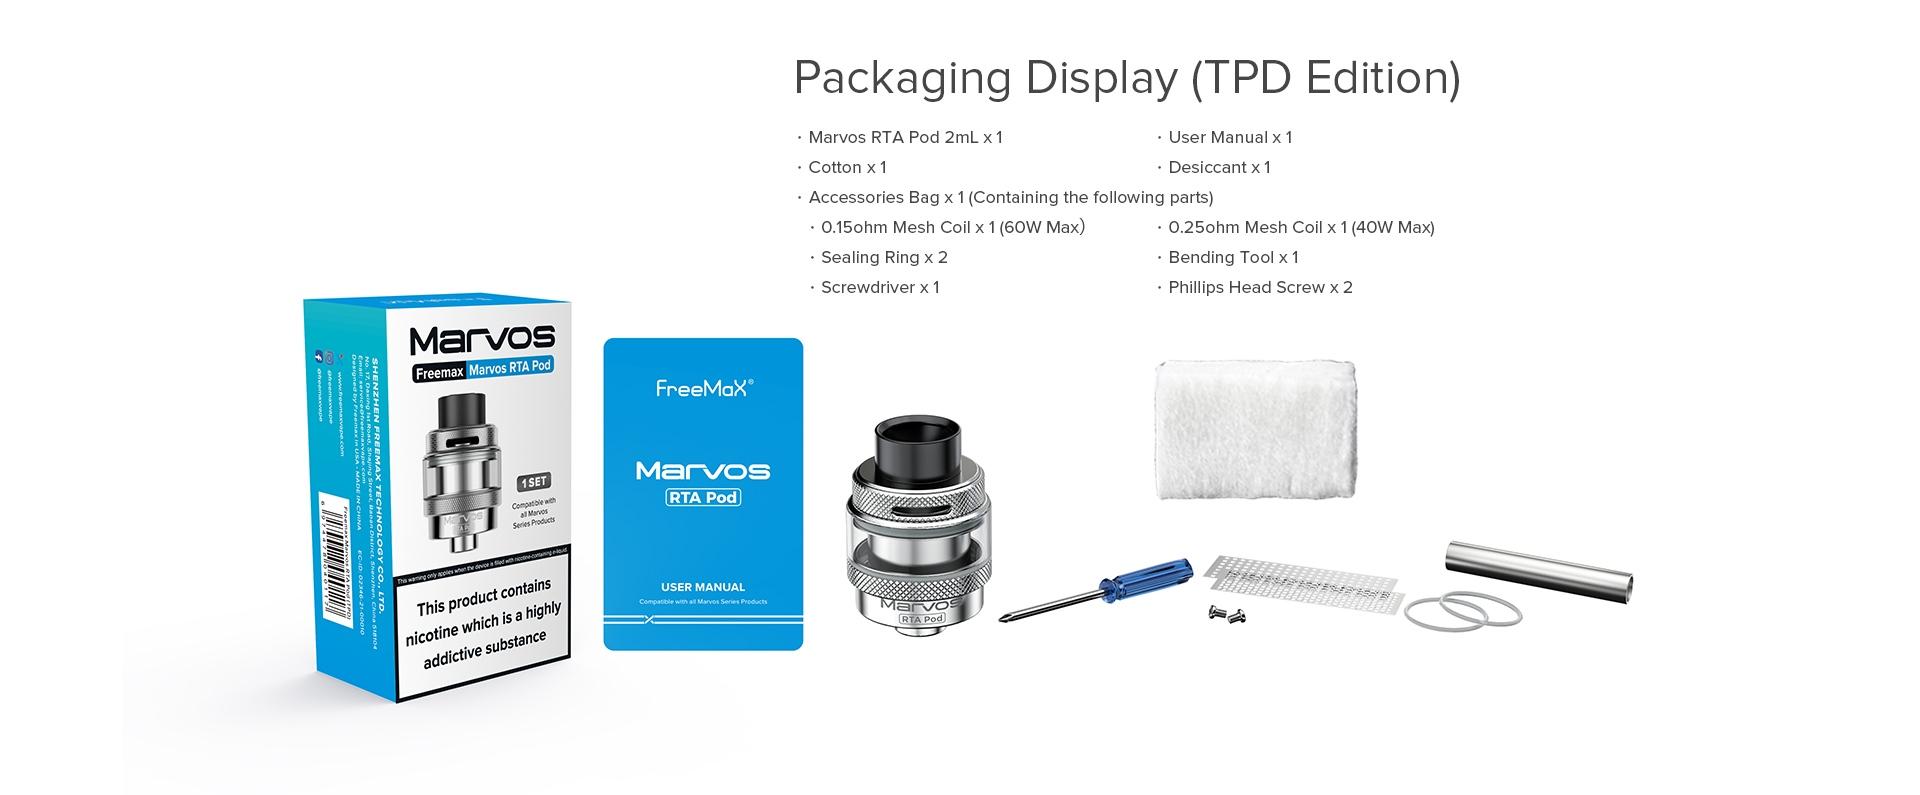 Marvos-RTA-Pod_Packaging Display TPD Edition)